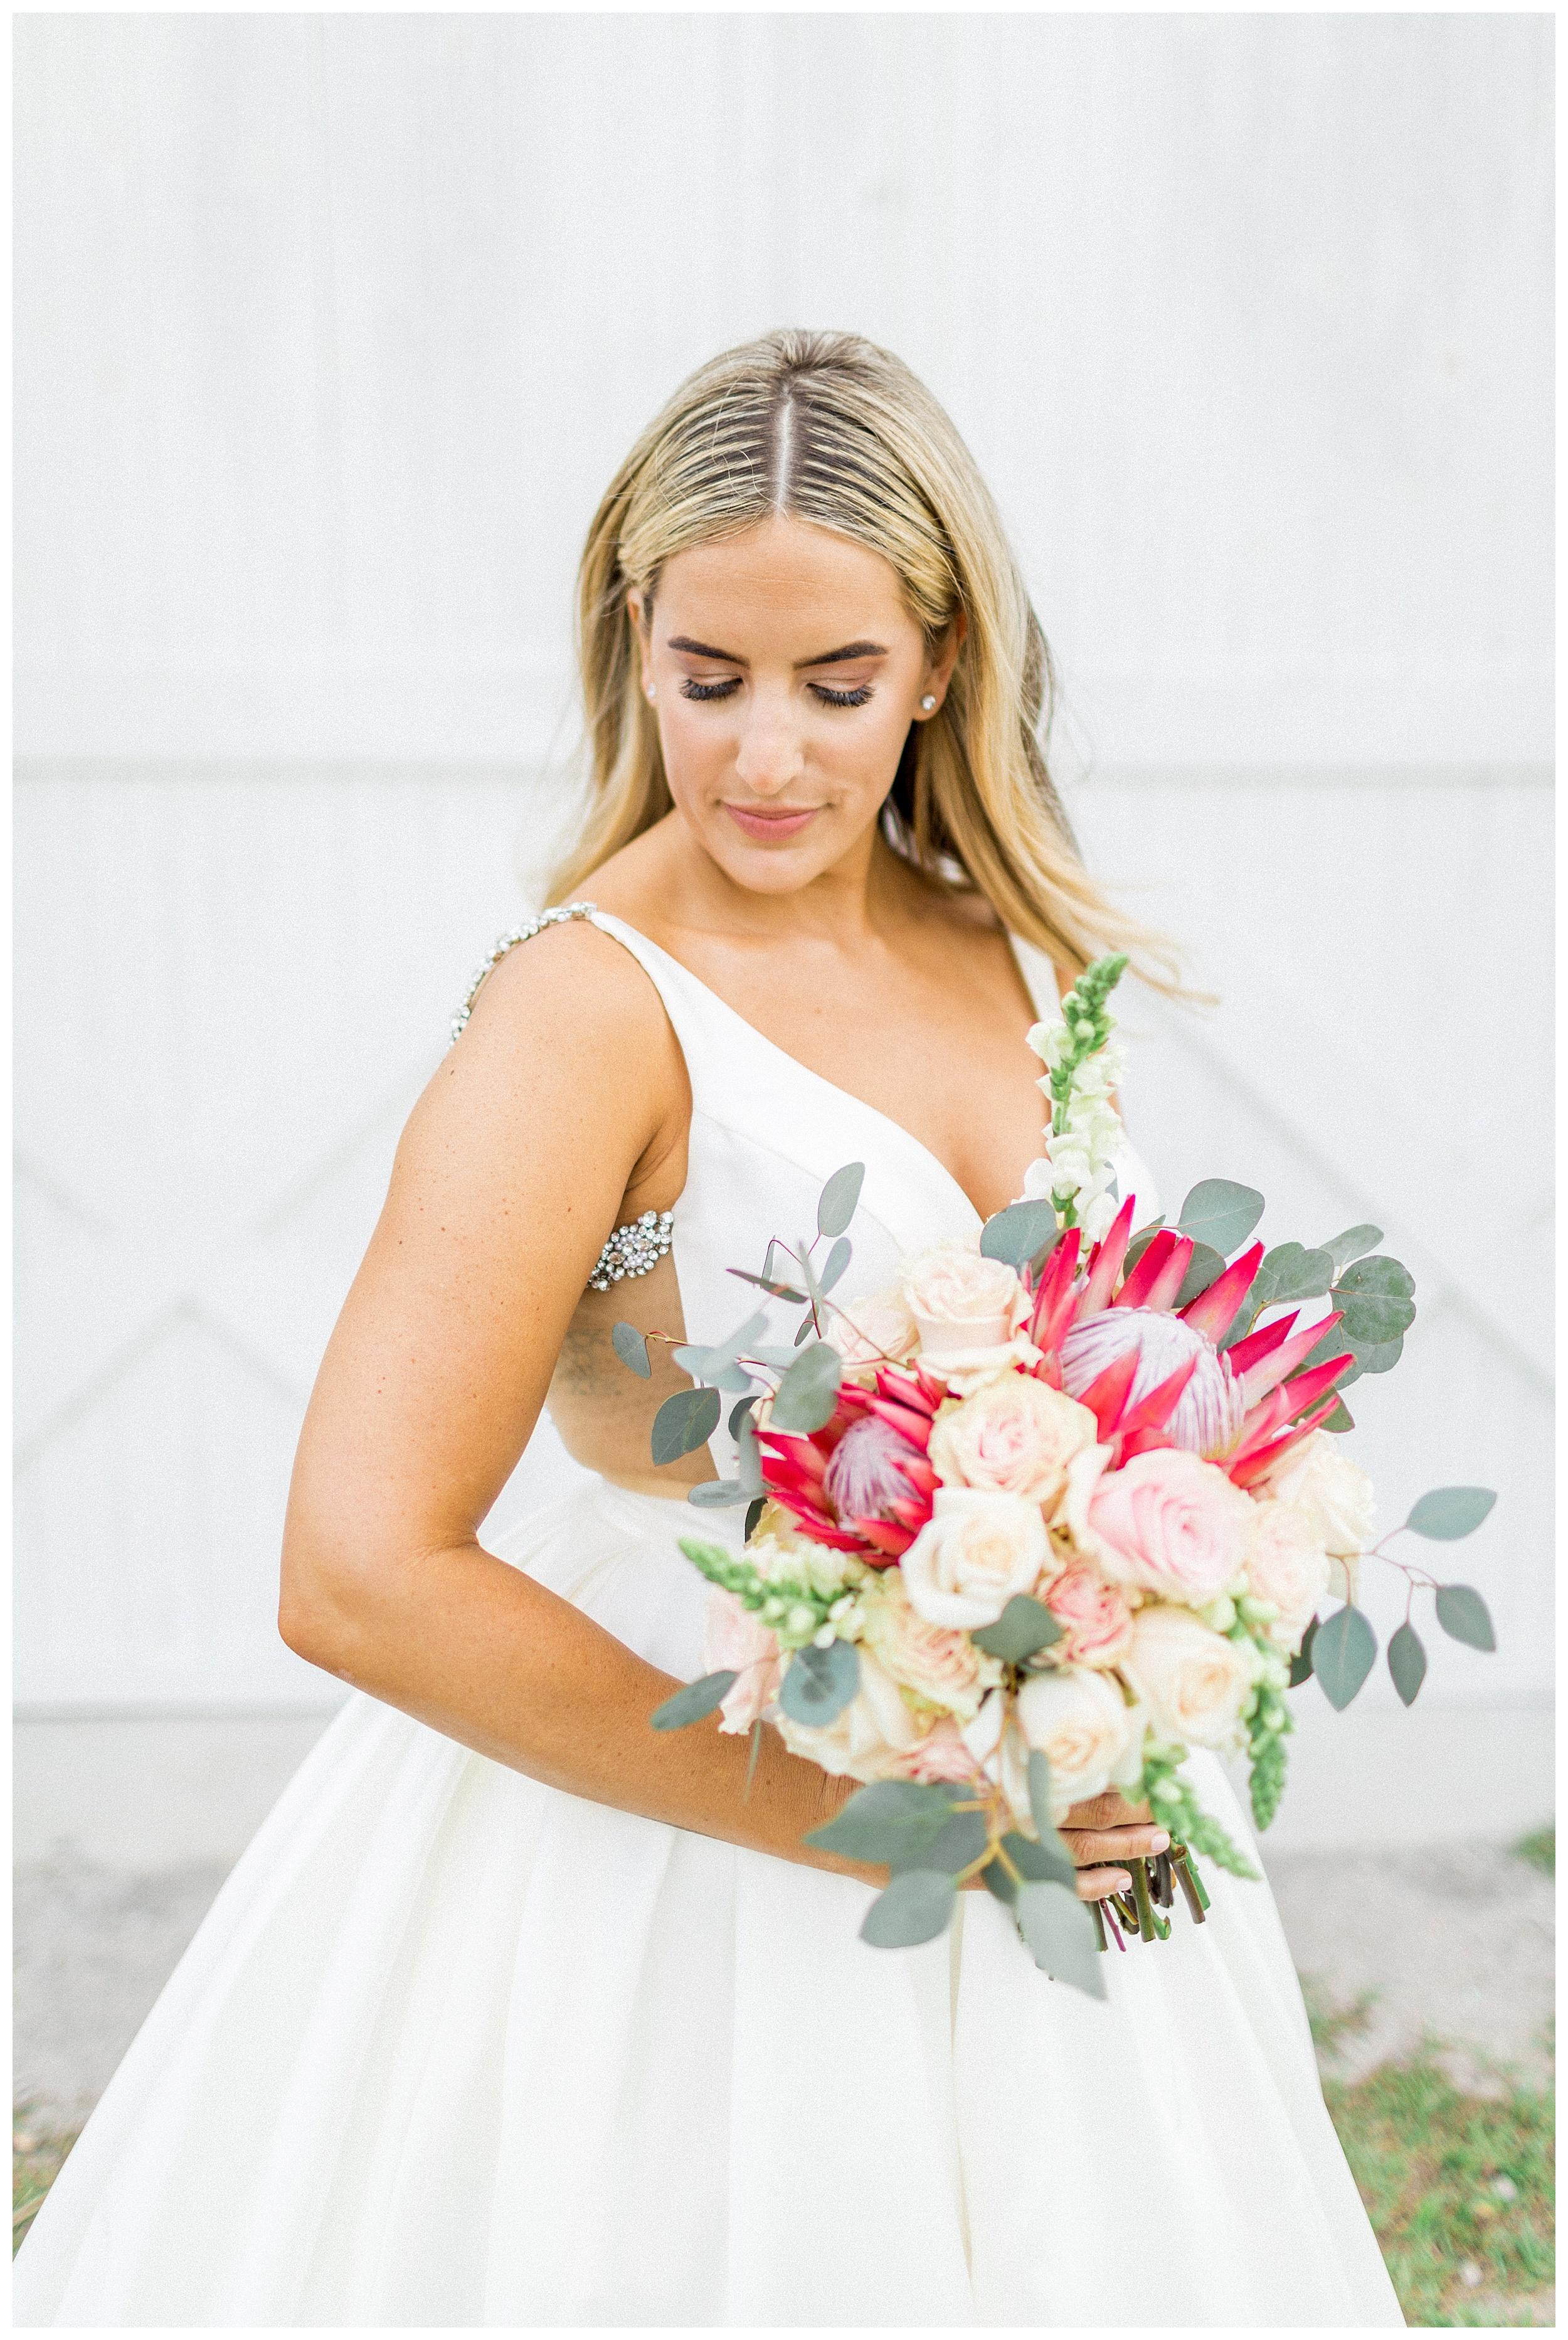 South Florida Wedding Photographer Kir Tuben_0023.jpg